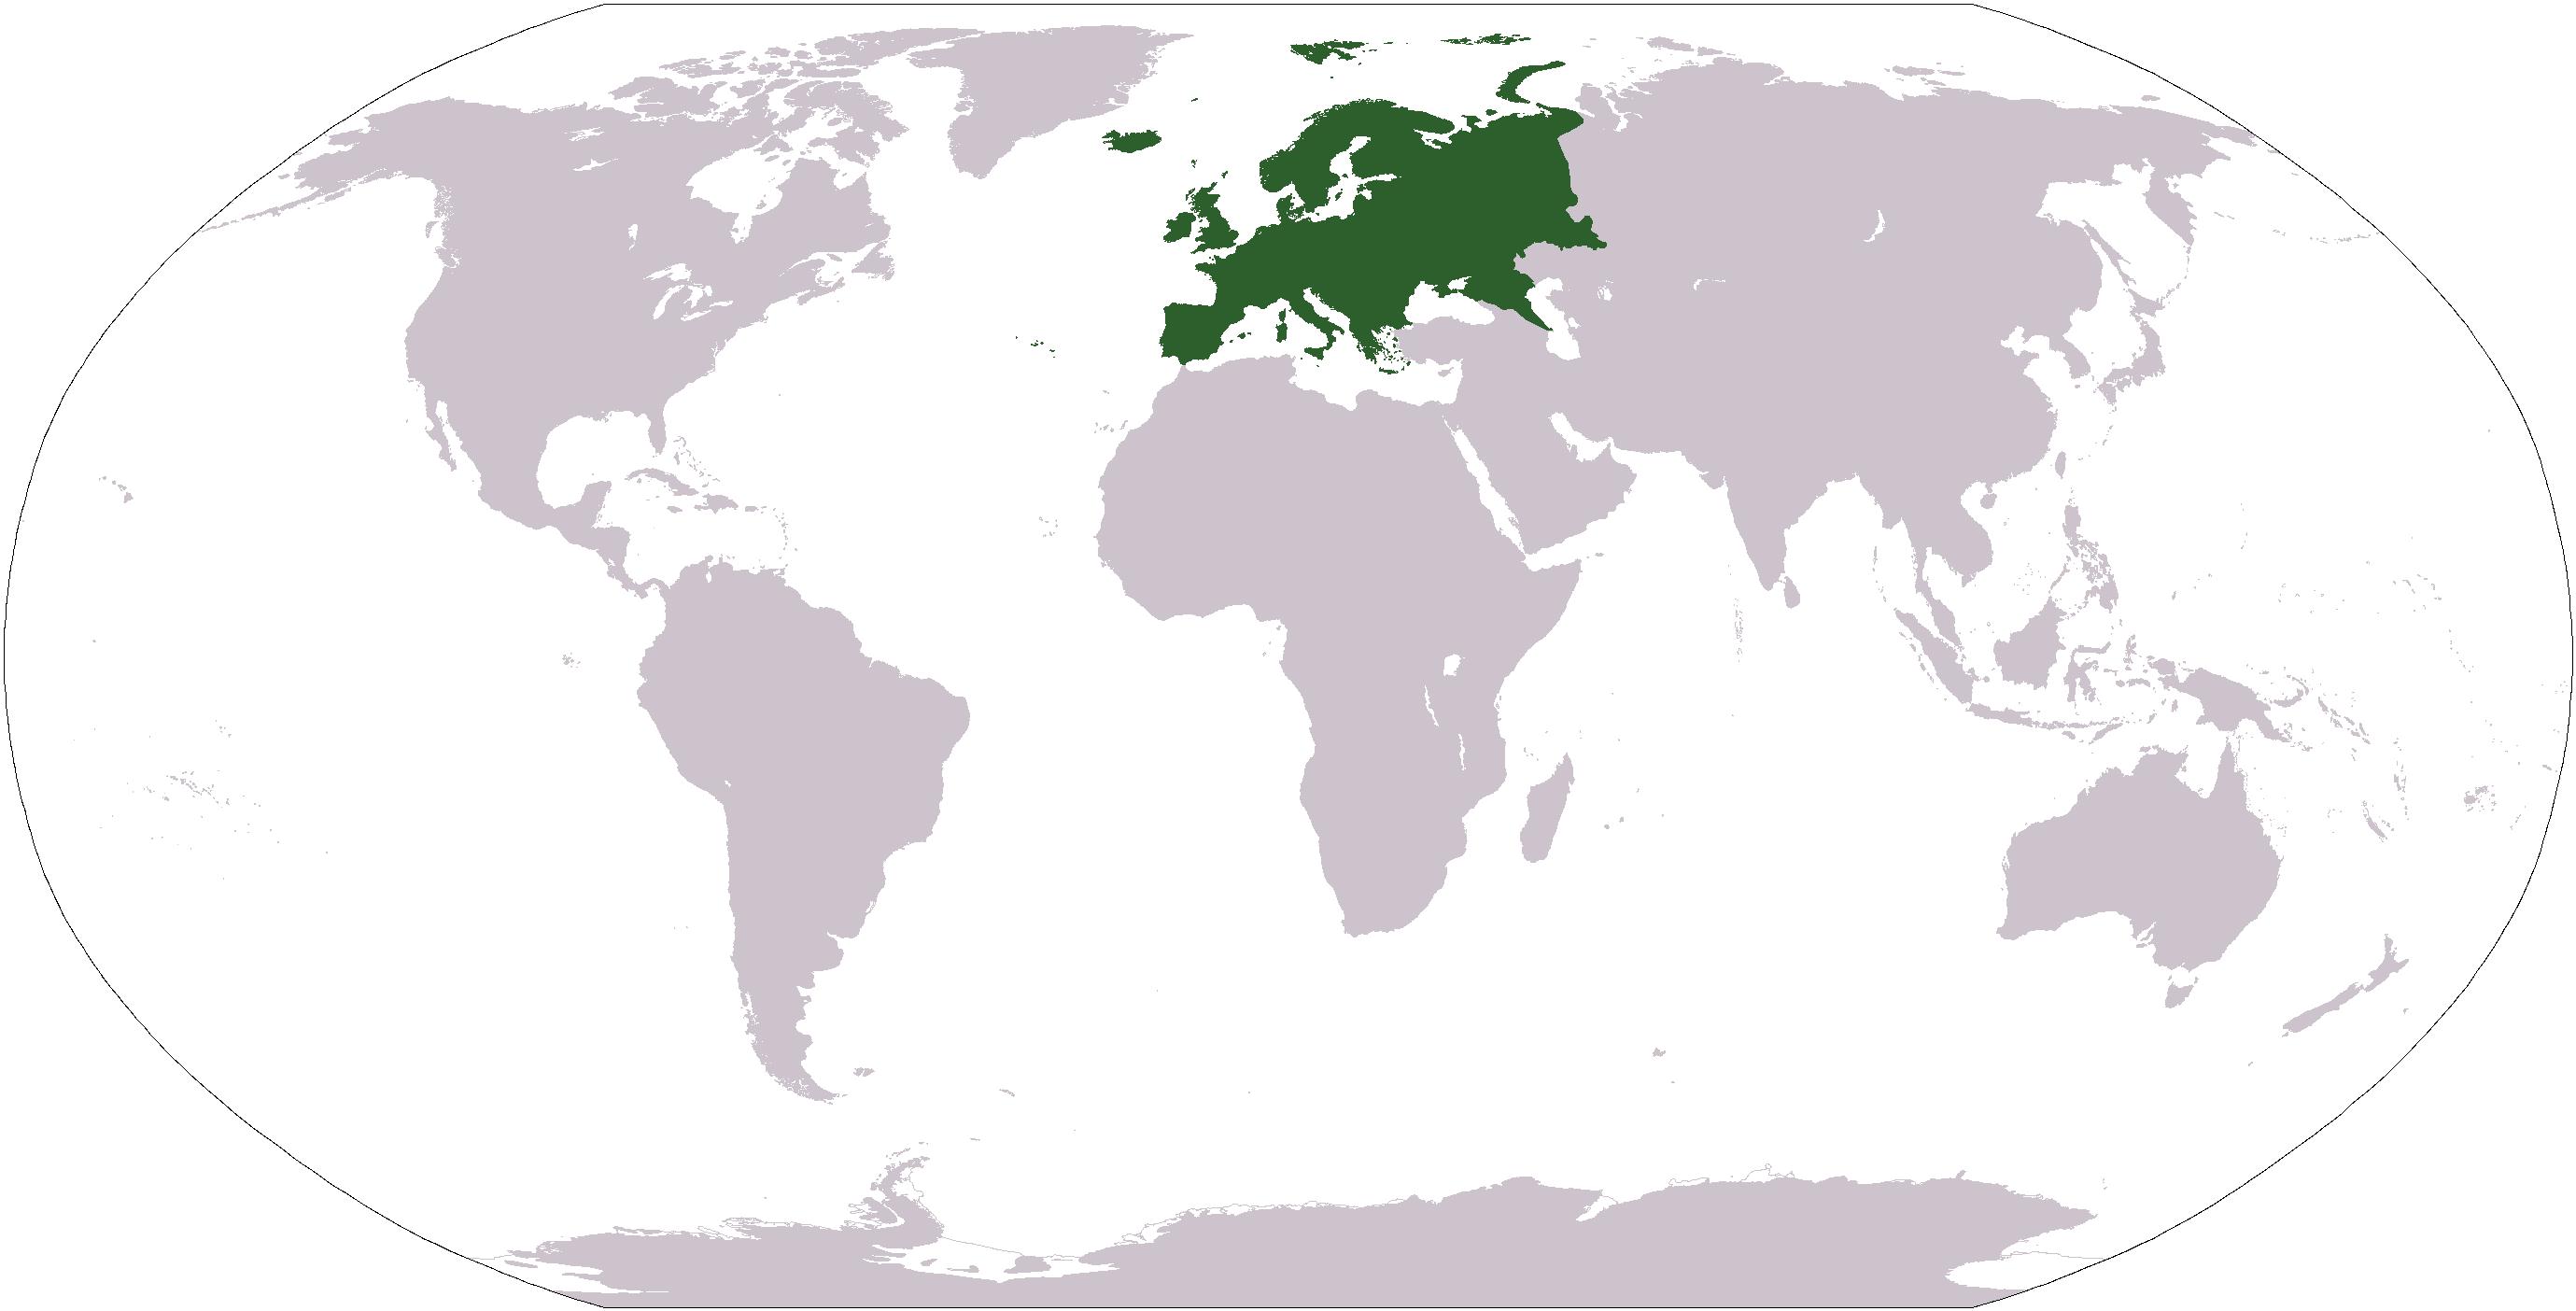 Europakarte Nordeuropa Karte.Landkarte Europa Landkarten Download Europakarte Europa Landkarte